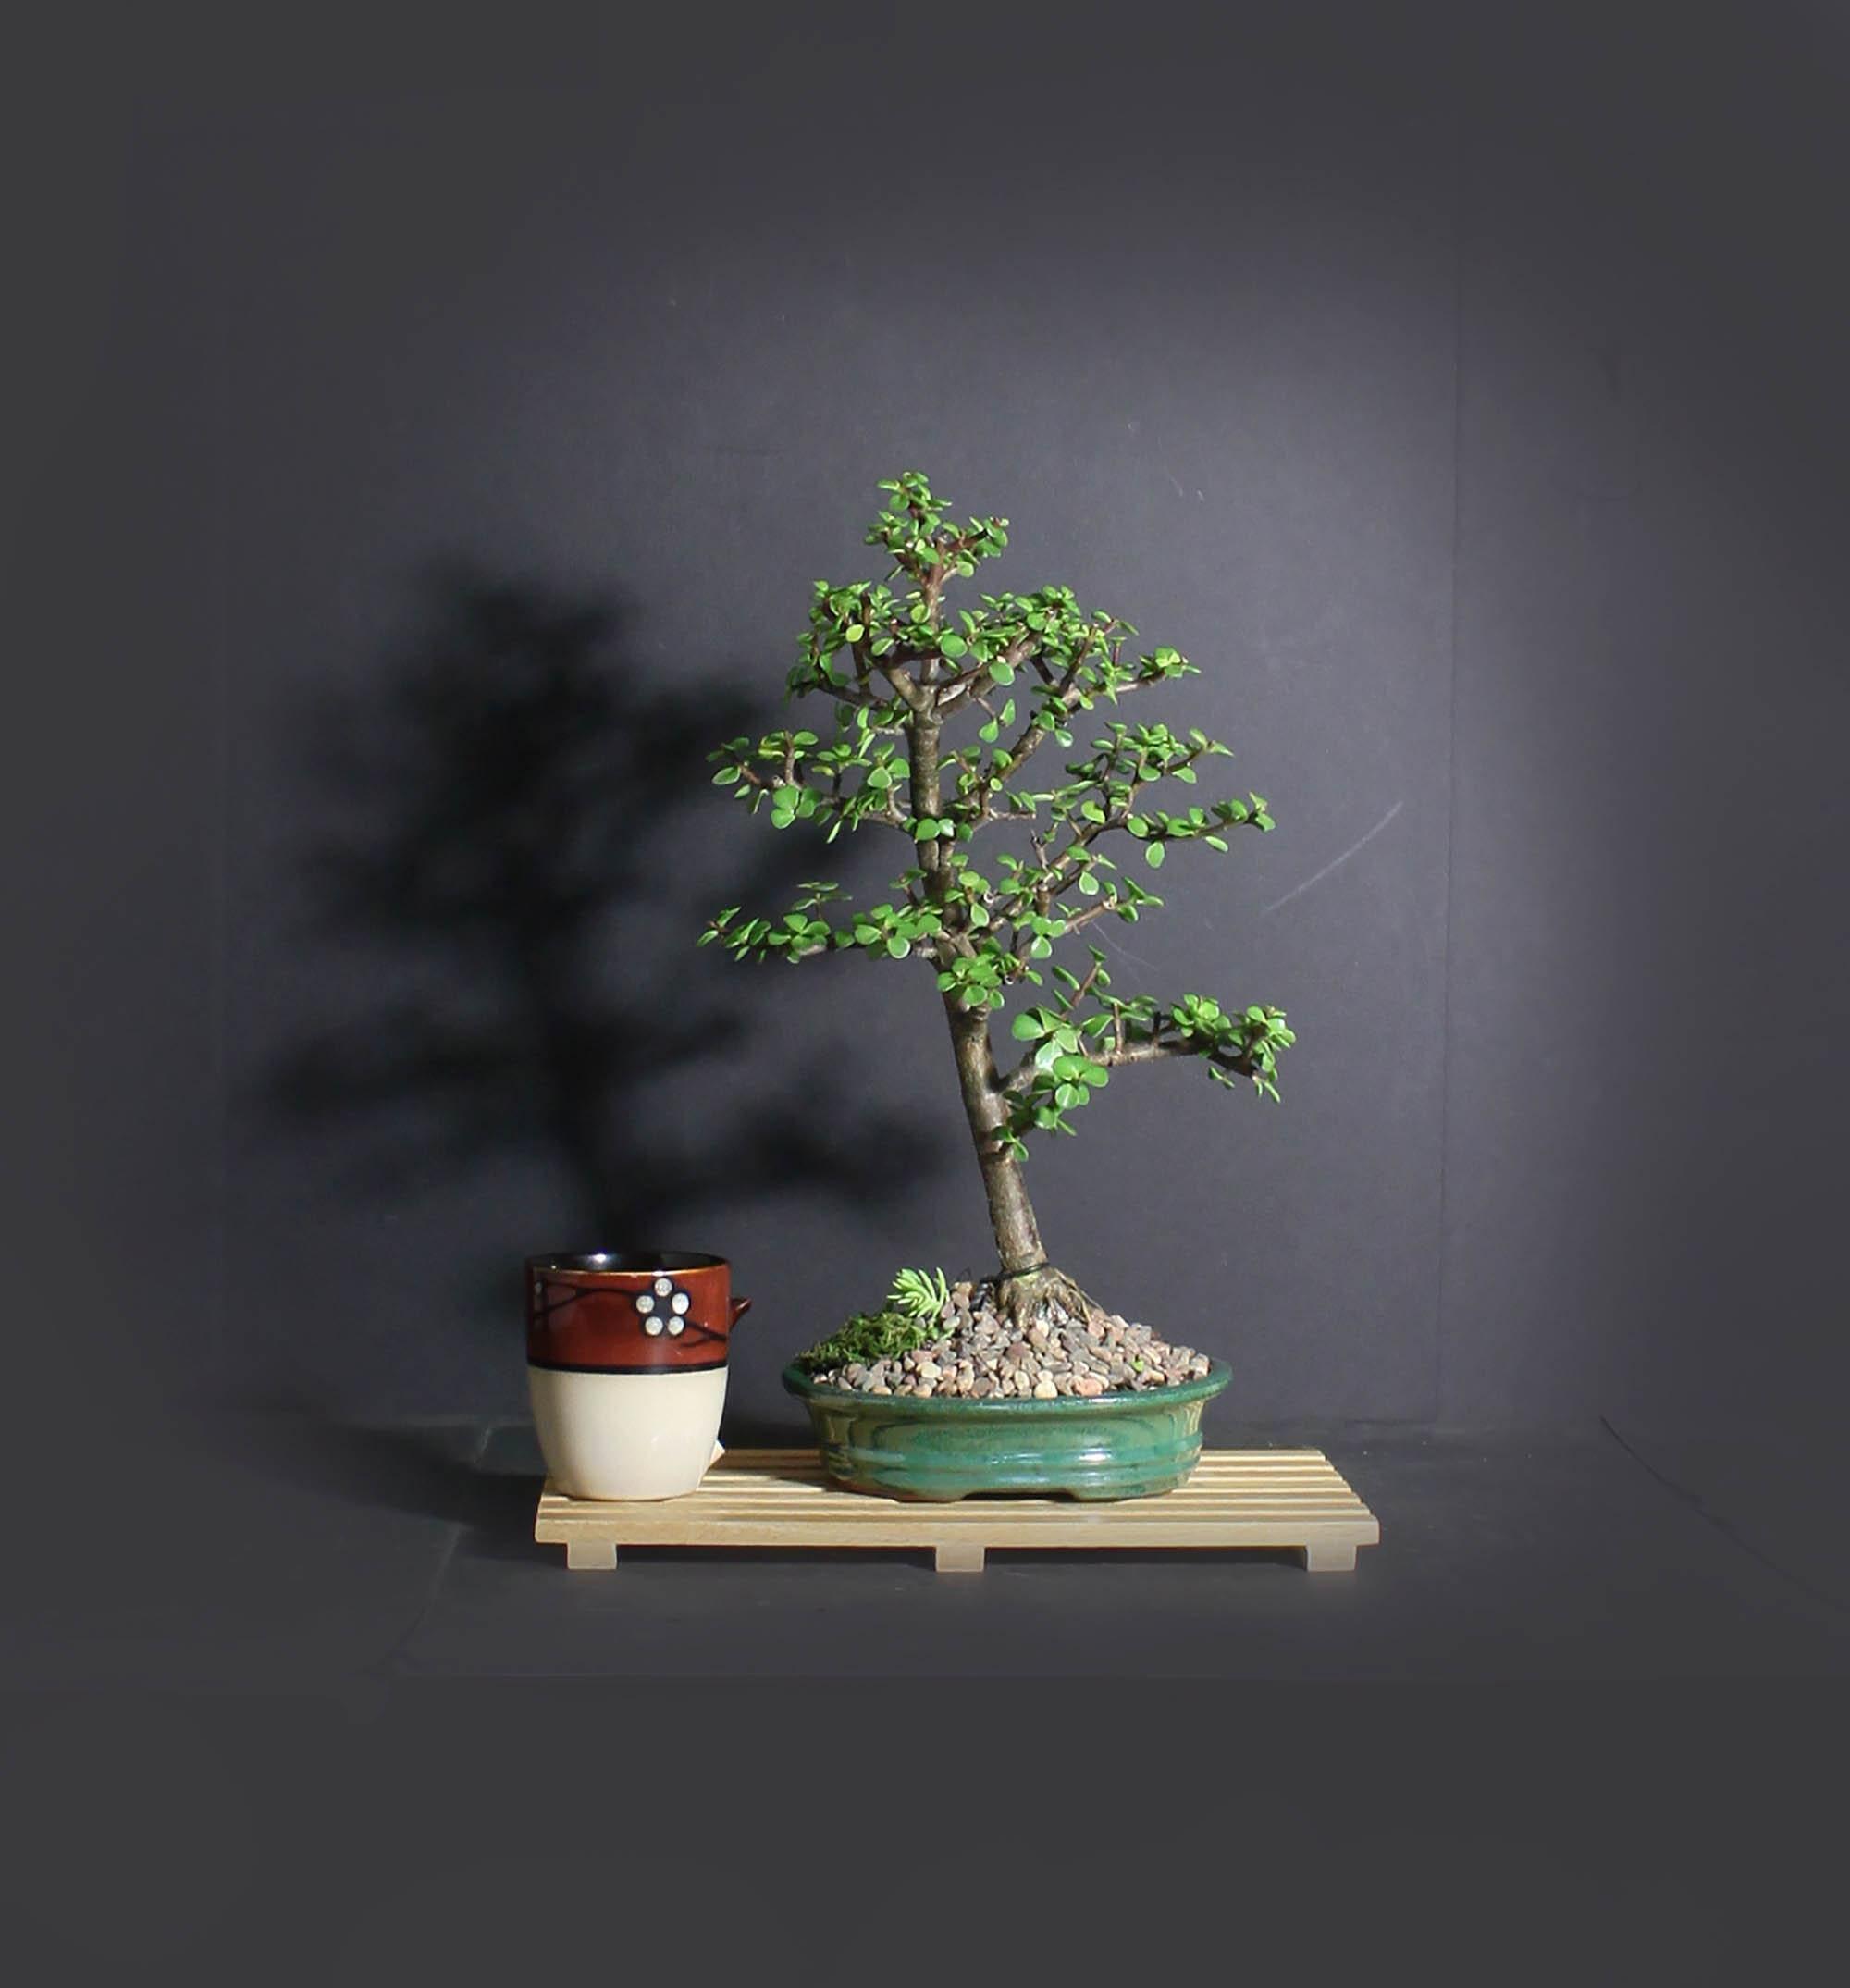 Dwarf Jade Bonsai Tree African Safari Bonsai Collection From Livebonsaitree